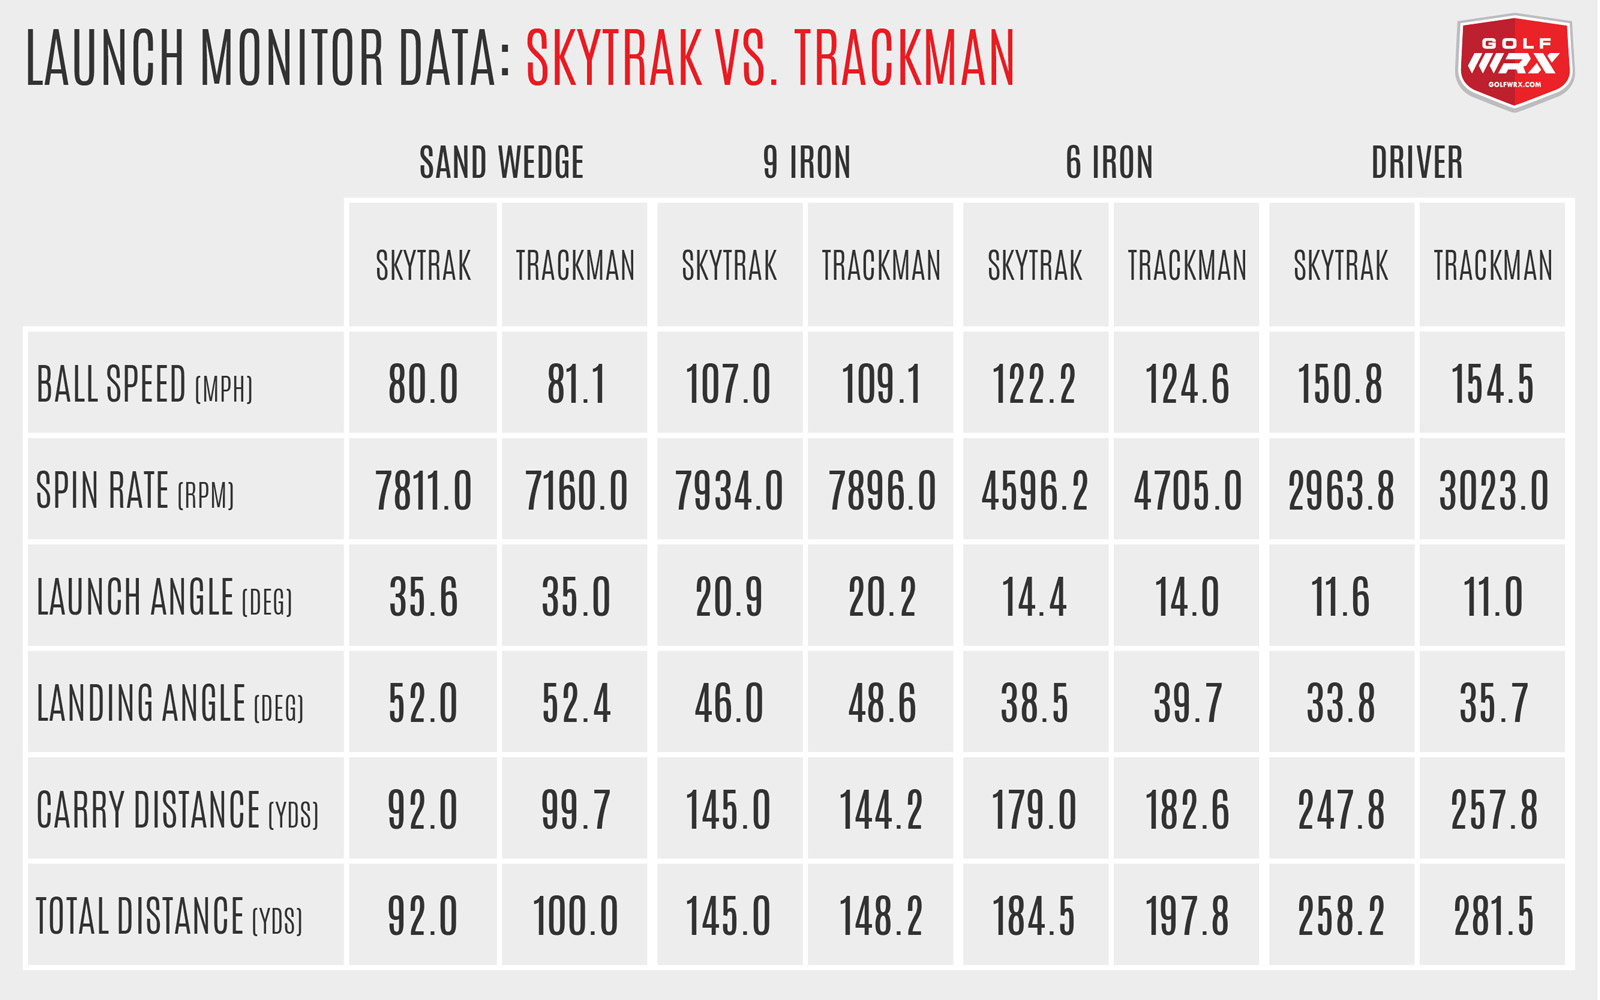 SkyTrak vs. Trackman Data